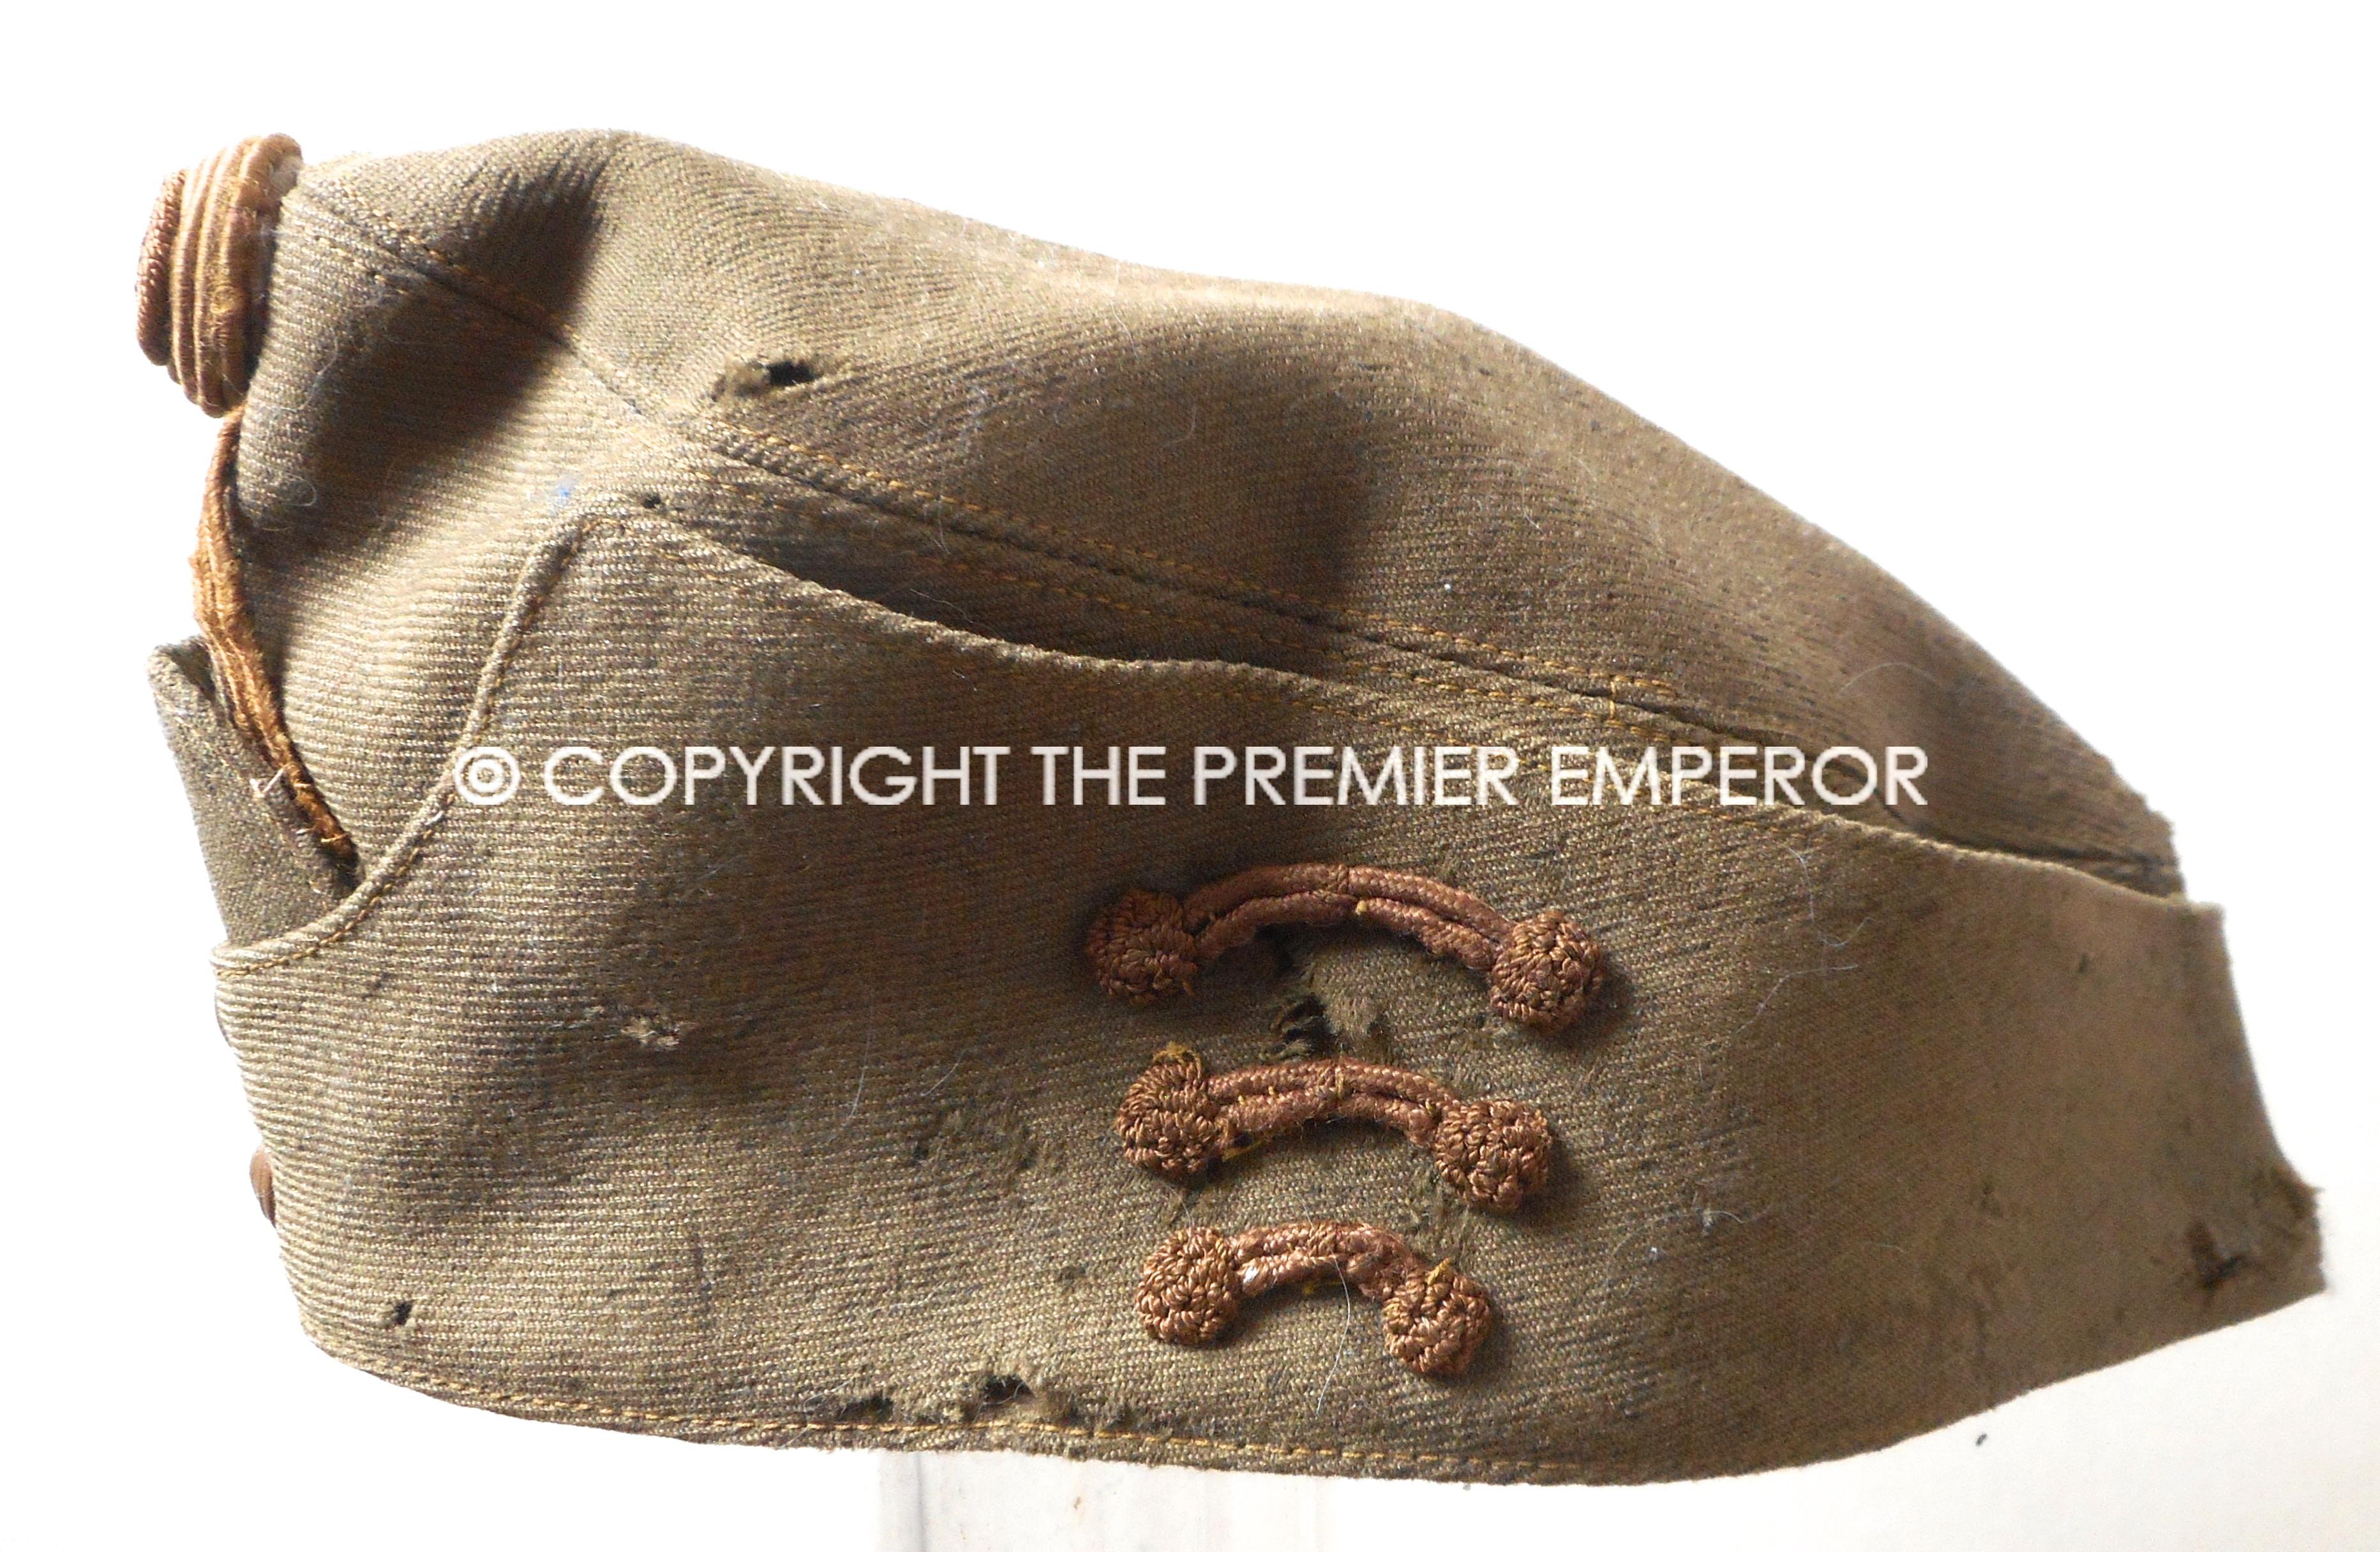 76e7ea95c Hungary. Hungarian Army Field Service side cap. Circa.1939/45